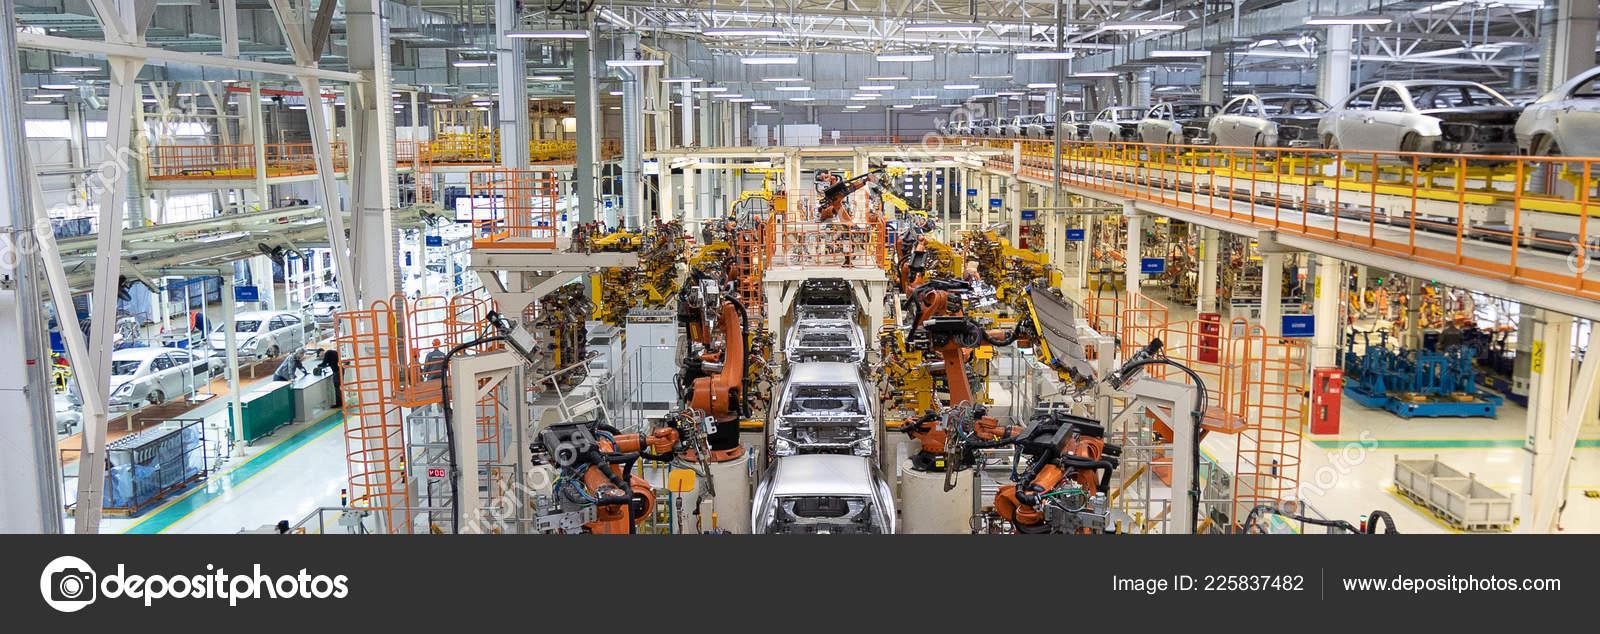 Welding of car body  Automotive production line  long format